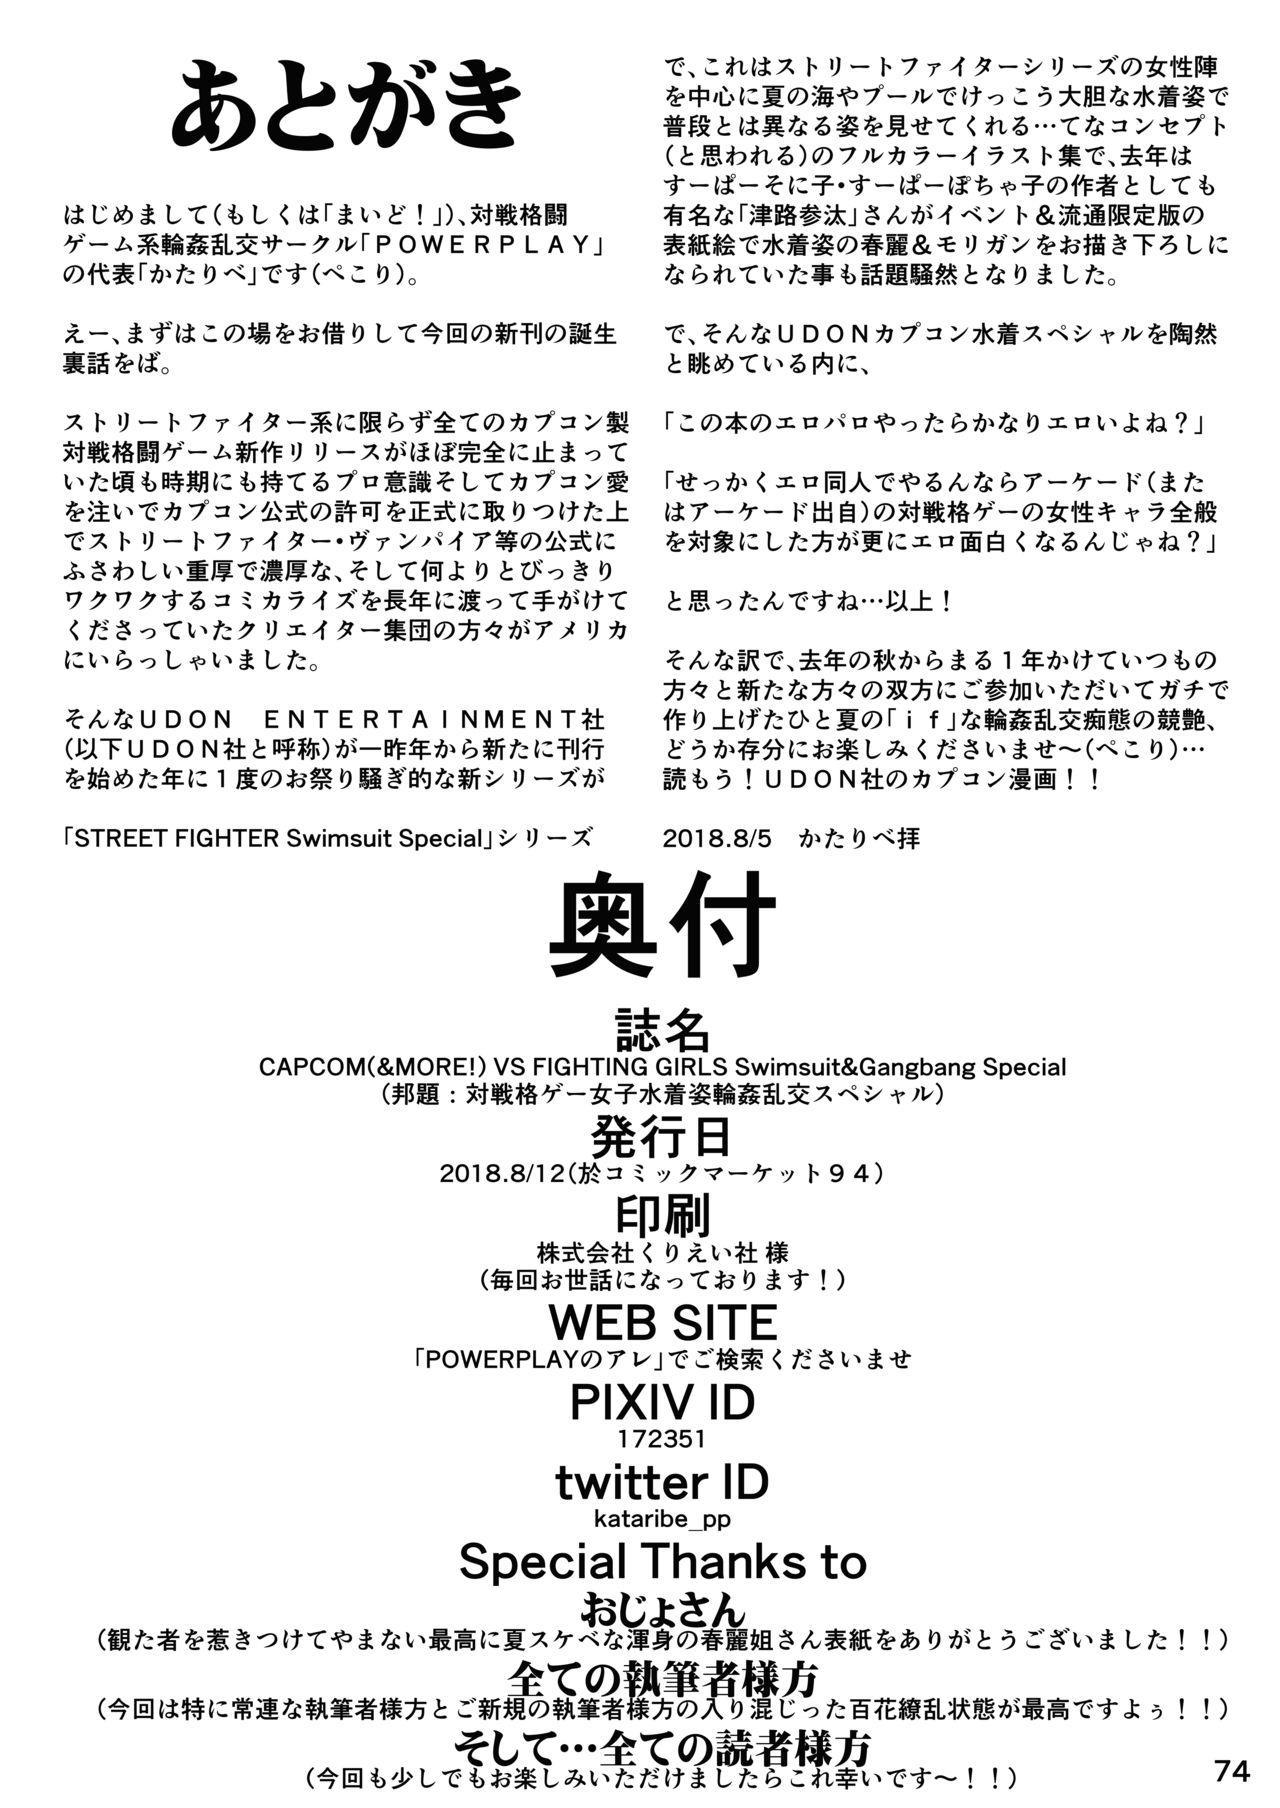 CA〇COM(&MORE!) VS FIGHTING GIRLS Swimsuit&Gangbang Special 72